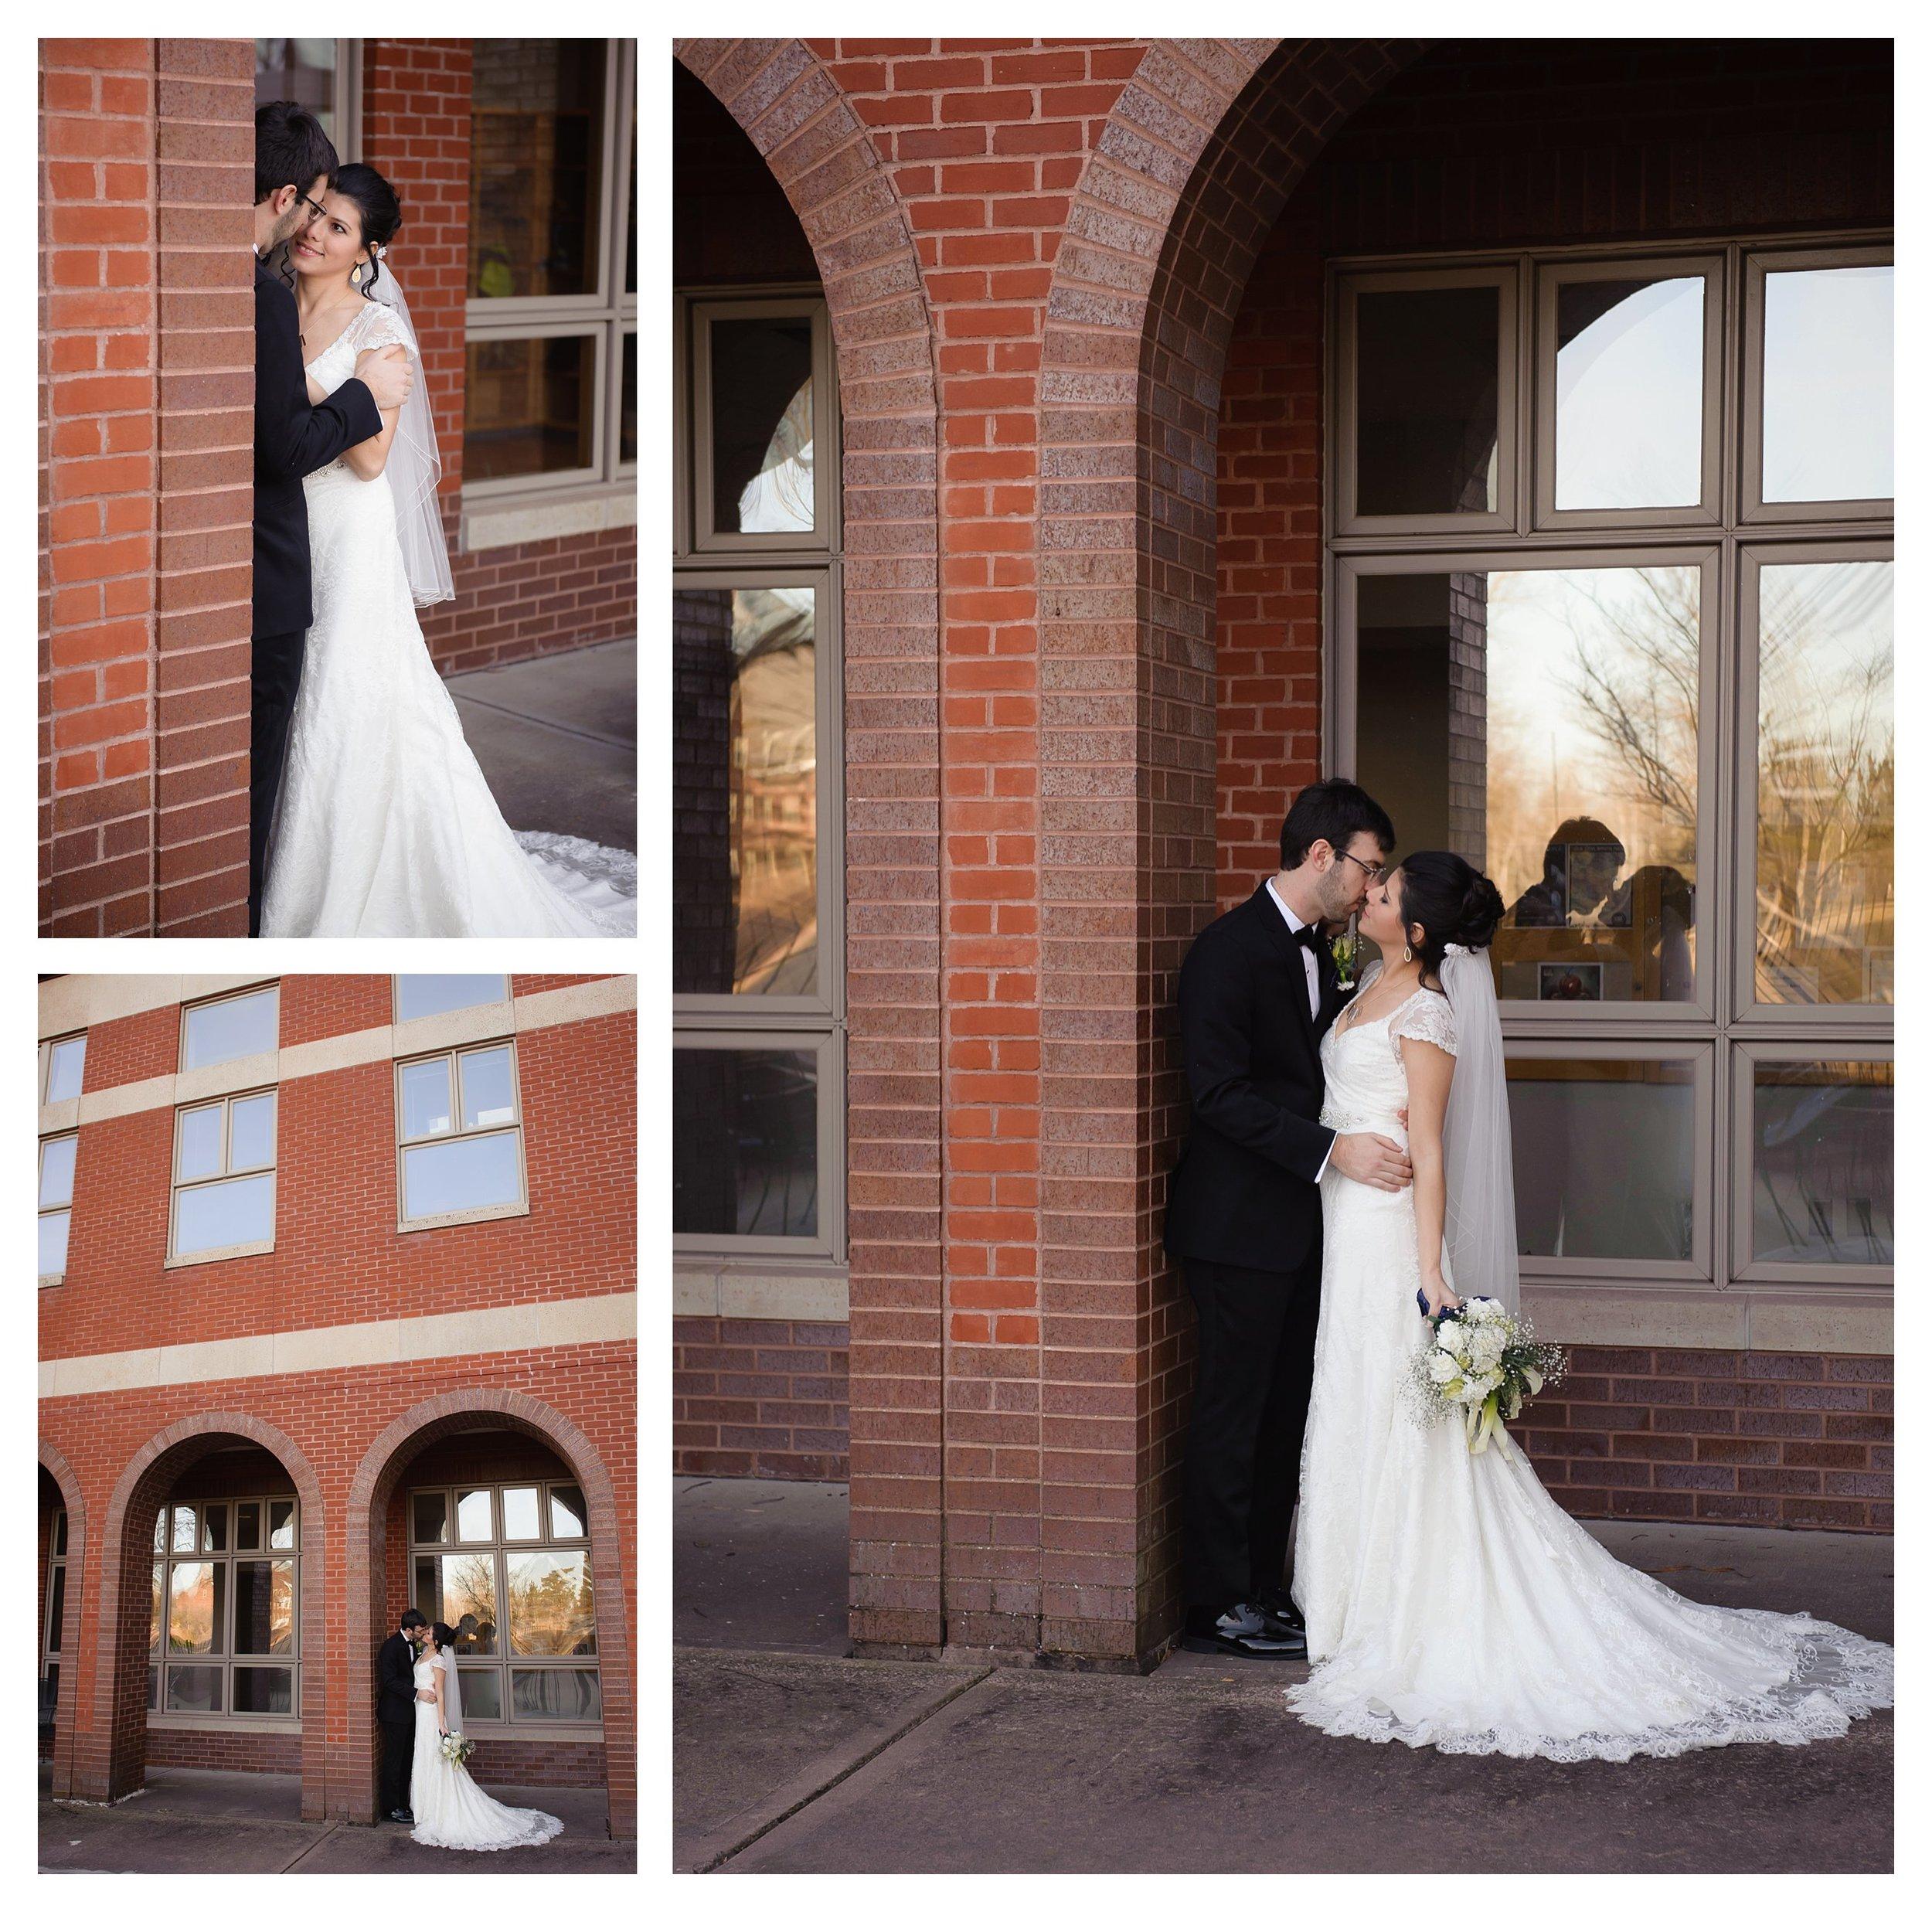 ashland wedding photographer iron river brule wisconsin ps 139 photography jen jensen_0136.jpg